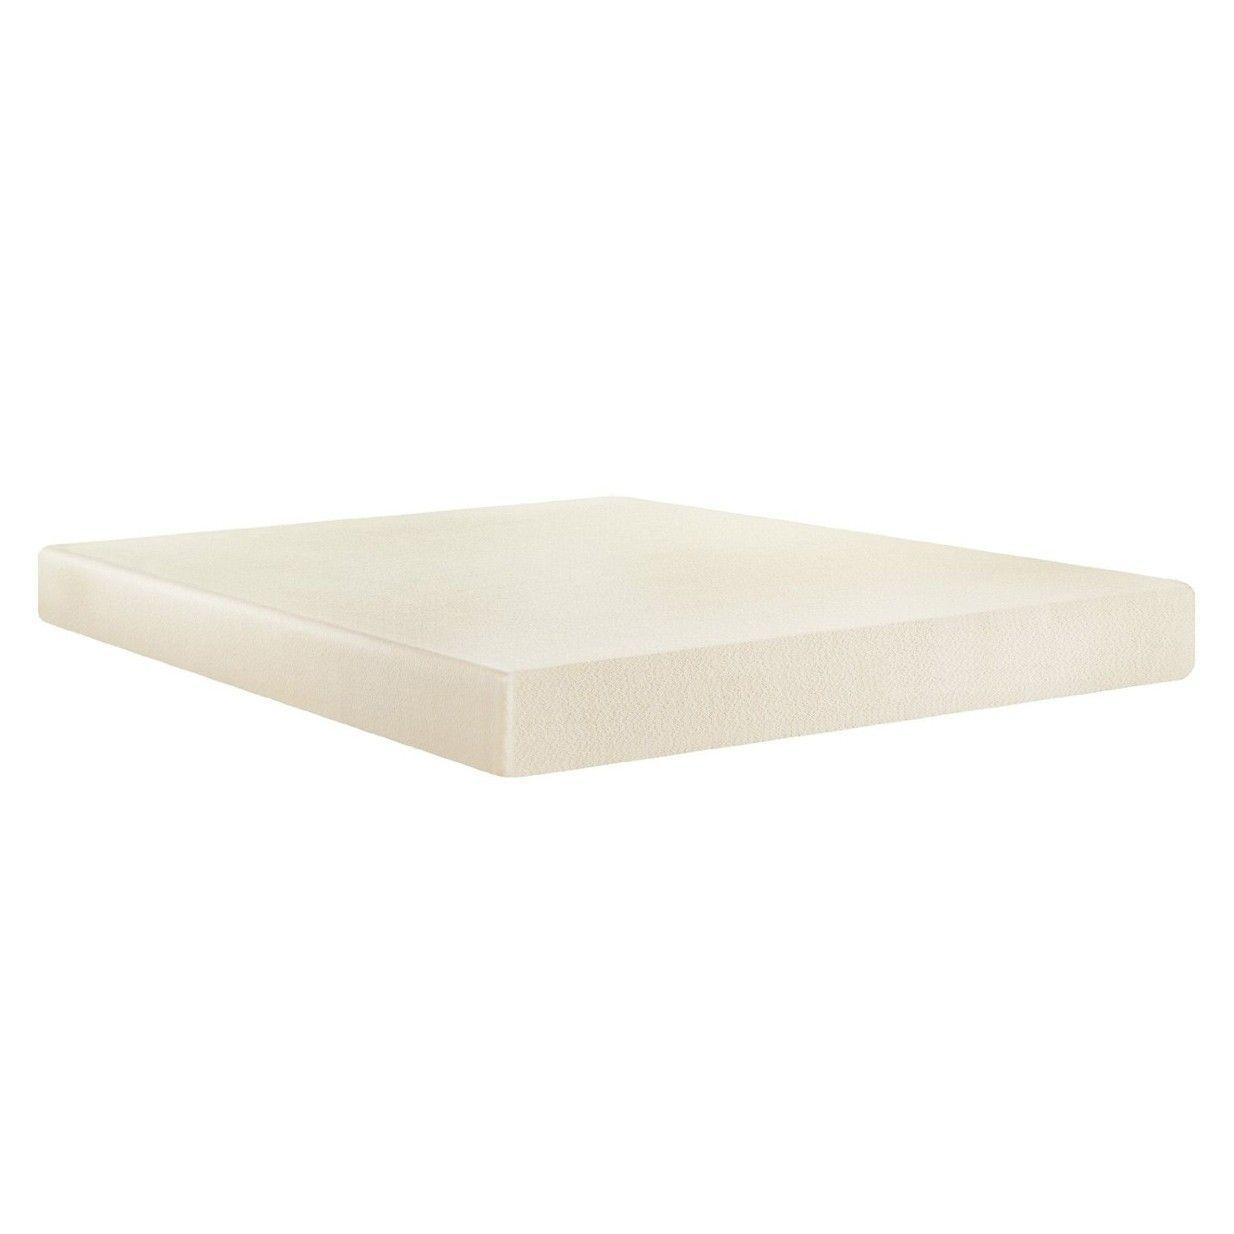 Full size inch Thick Memory Foam Mattress Foam mattress Memory